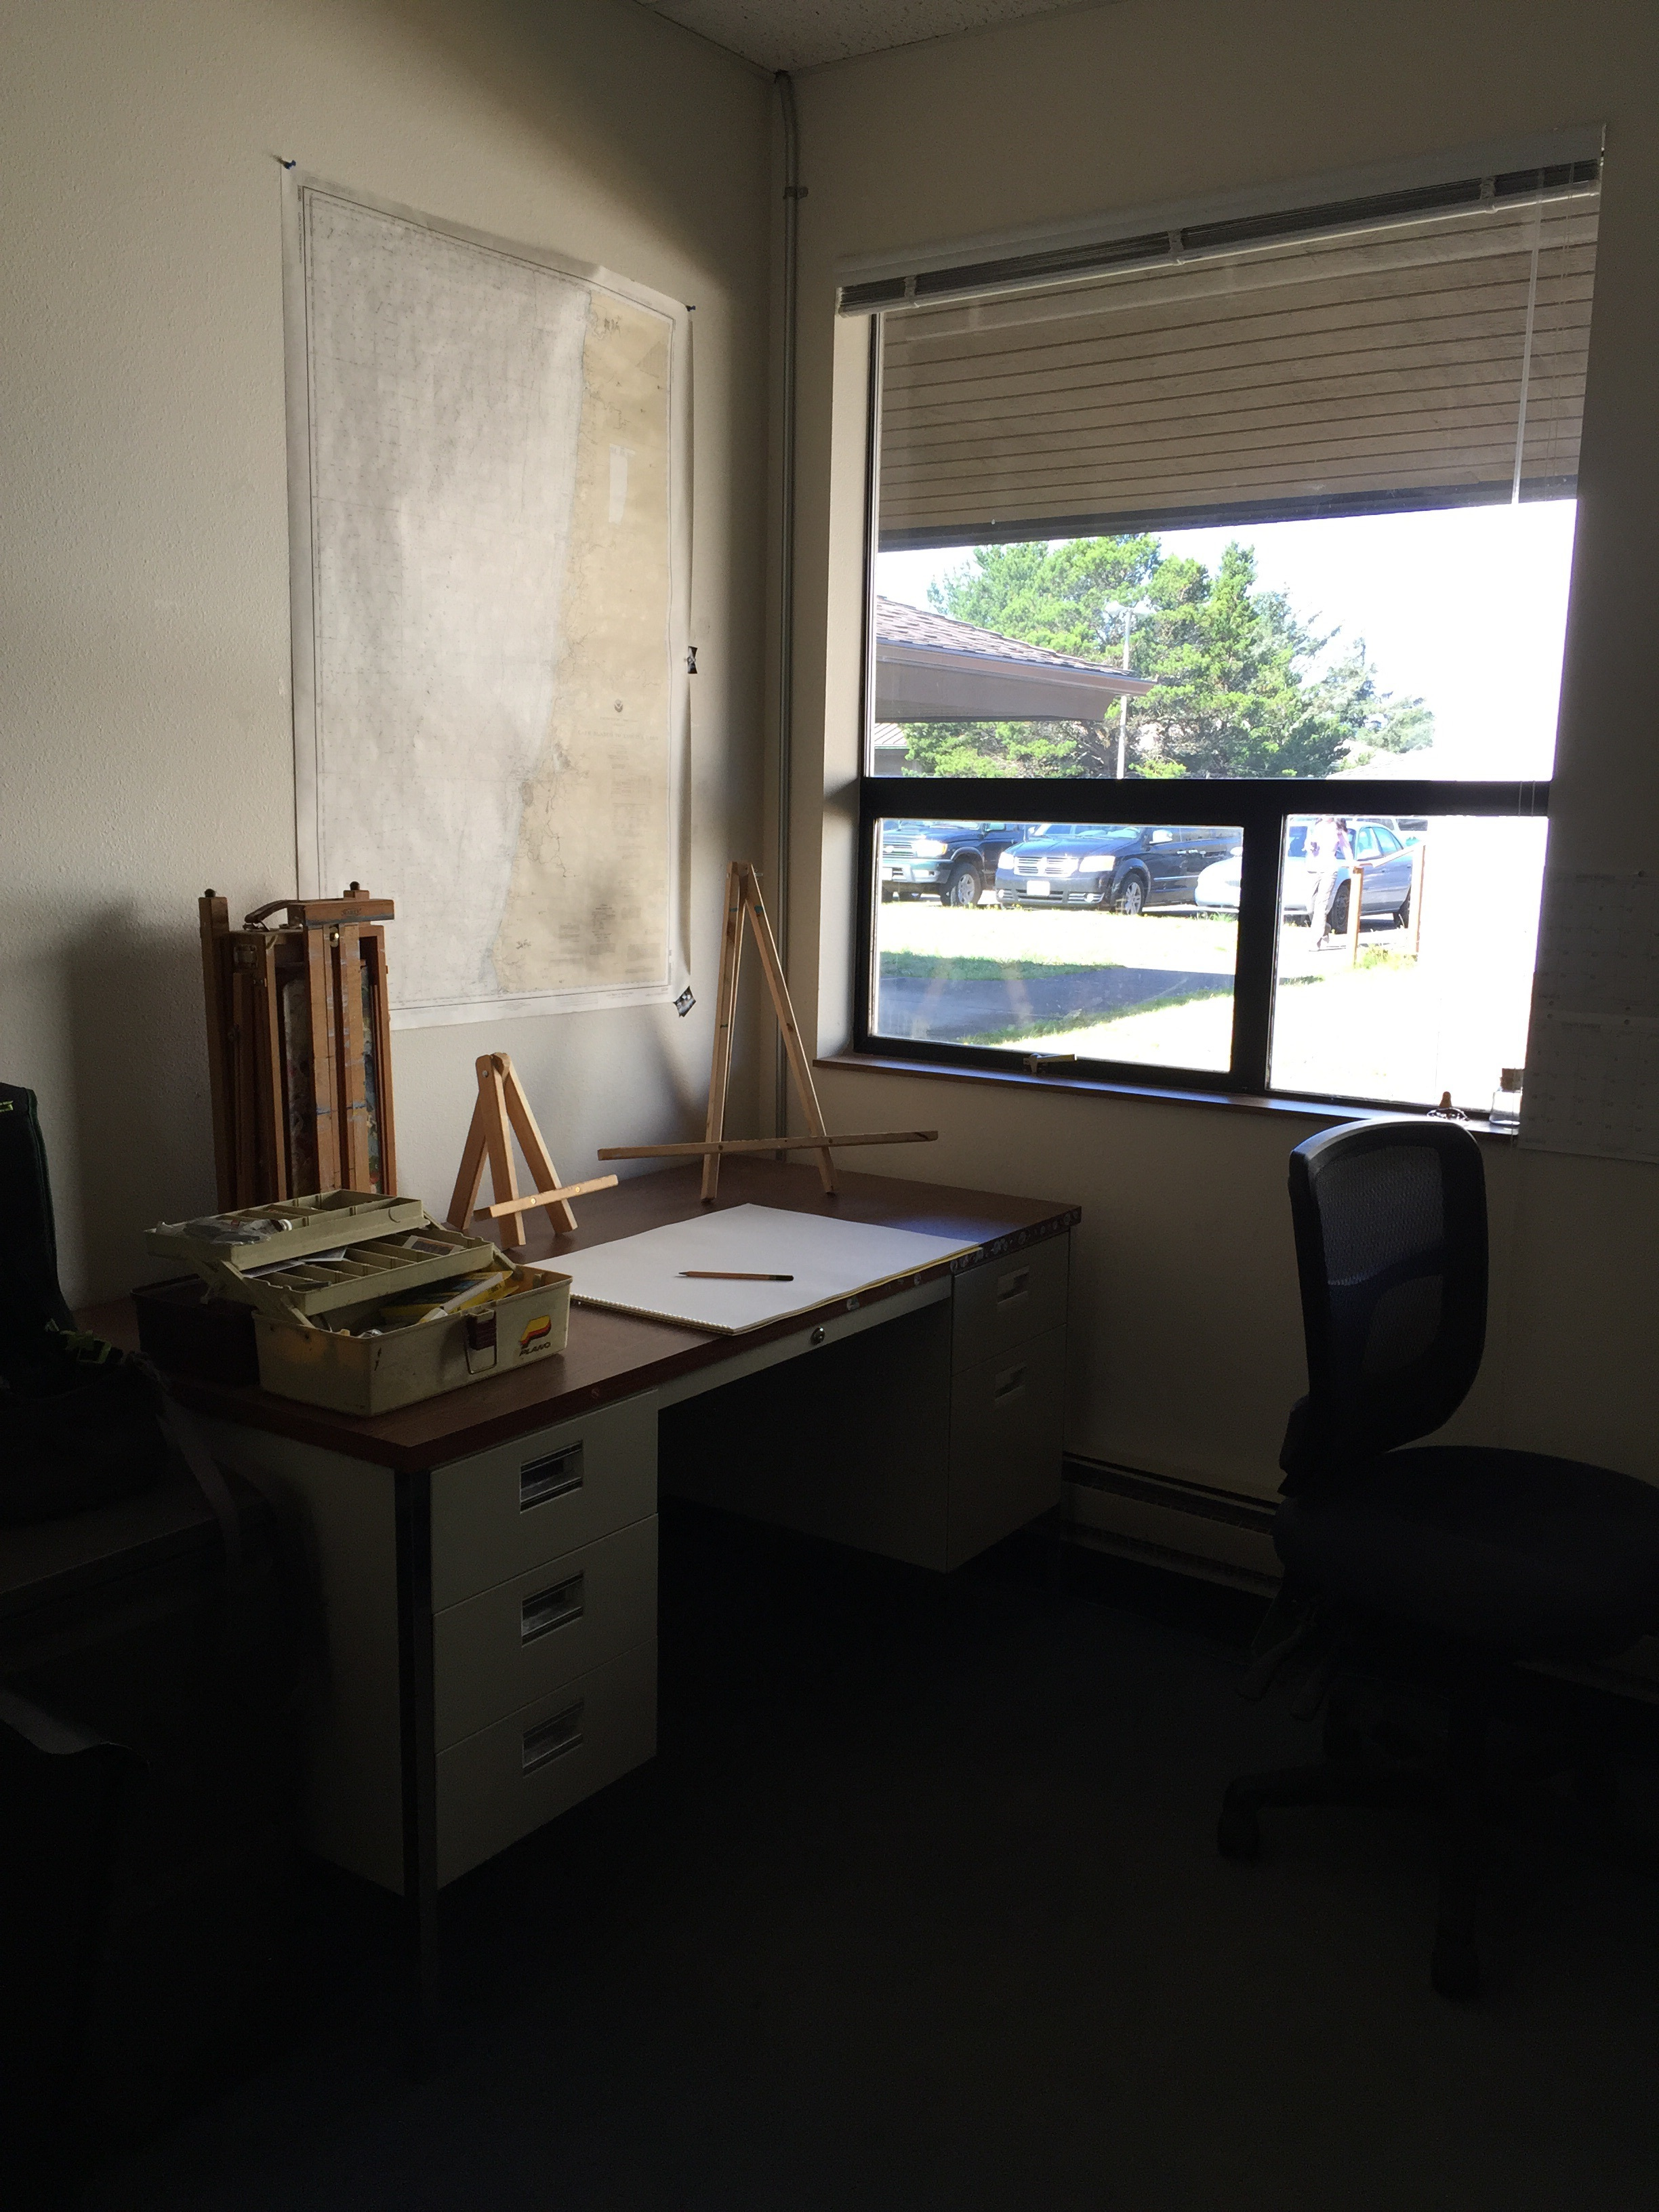 Settling into my studio